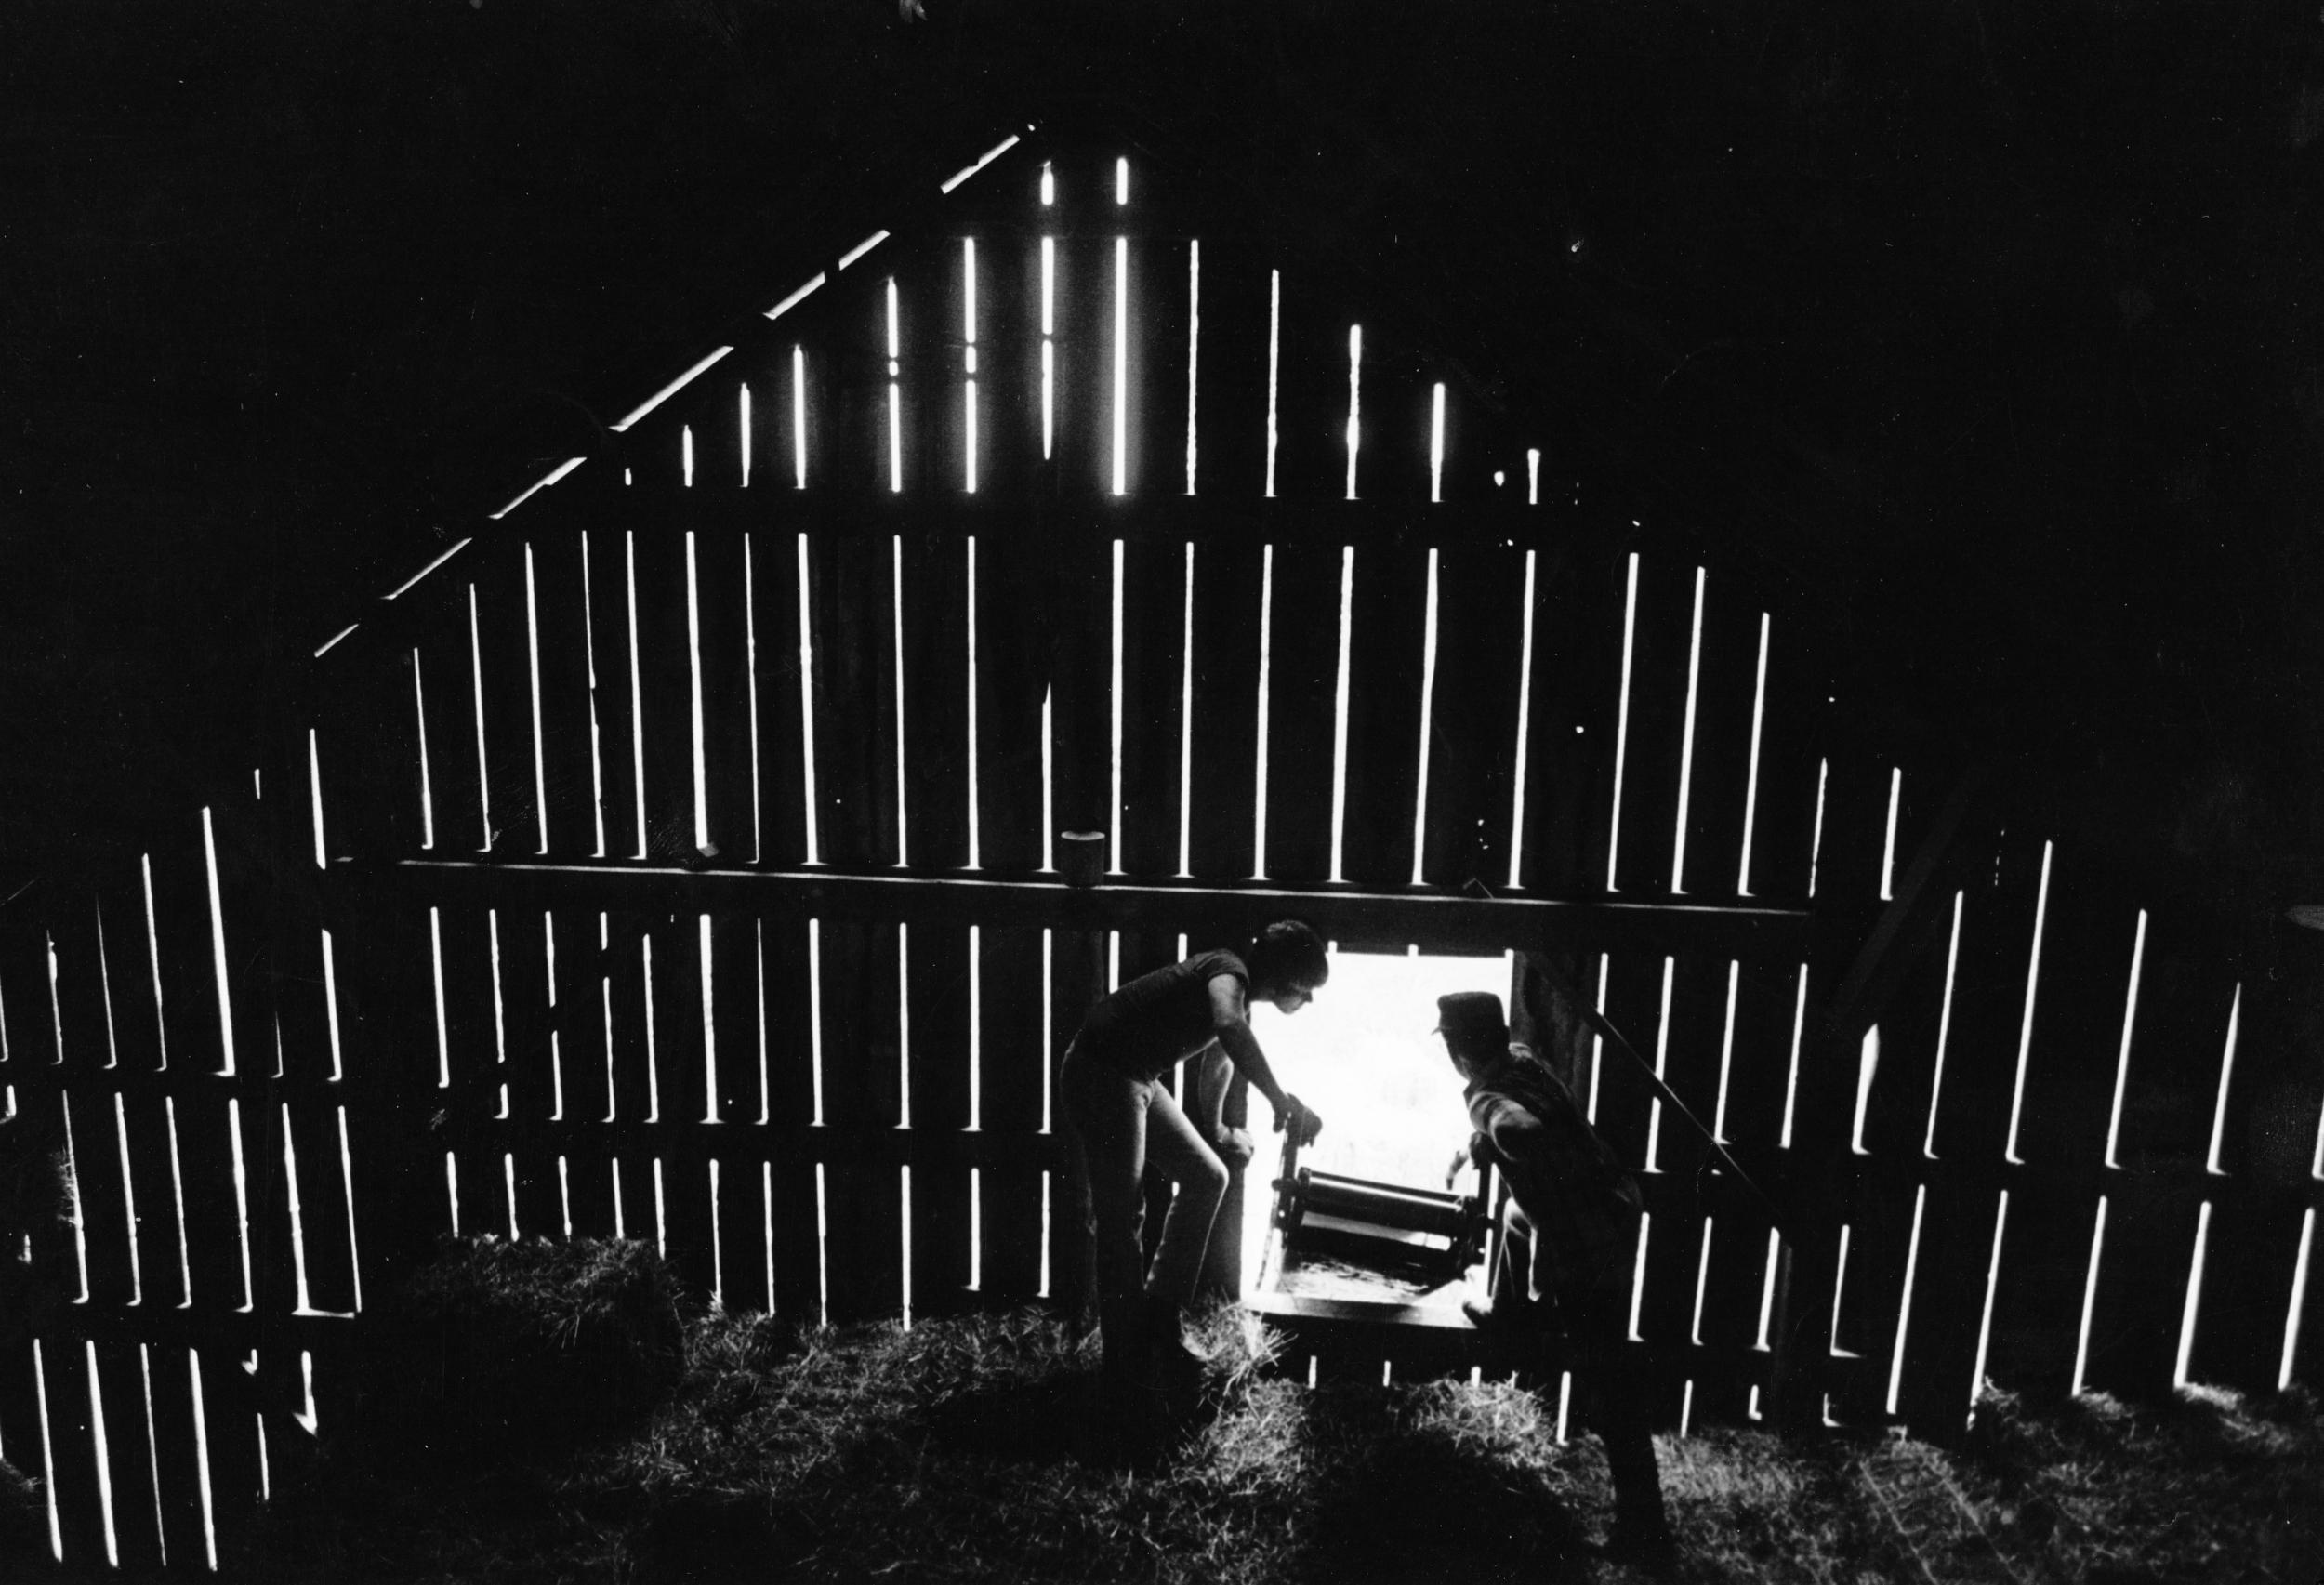 The Haas farm near Rolla, Missouri, 1975. Photograph by Bill Marr